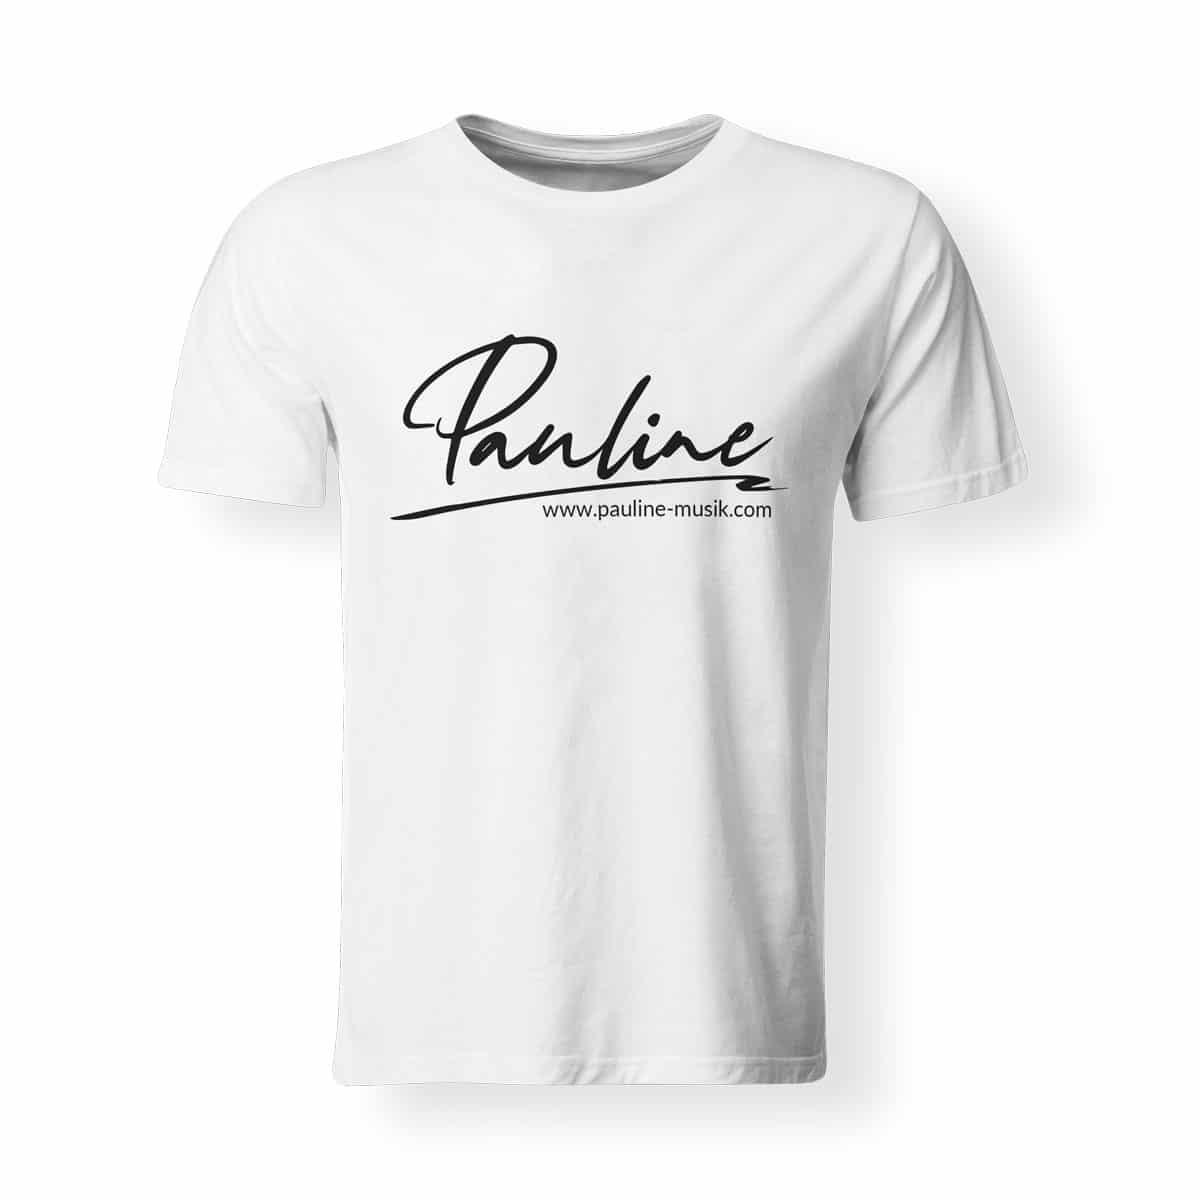 T-Shirt Herren Pauline weiss